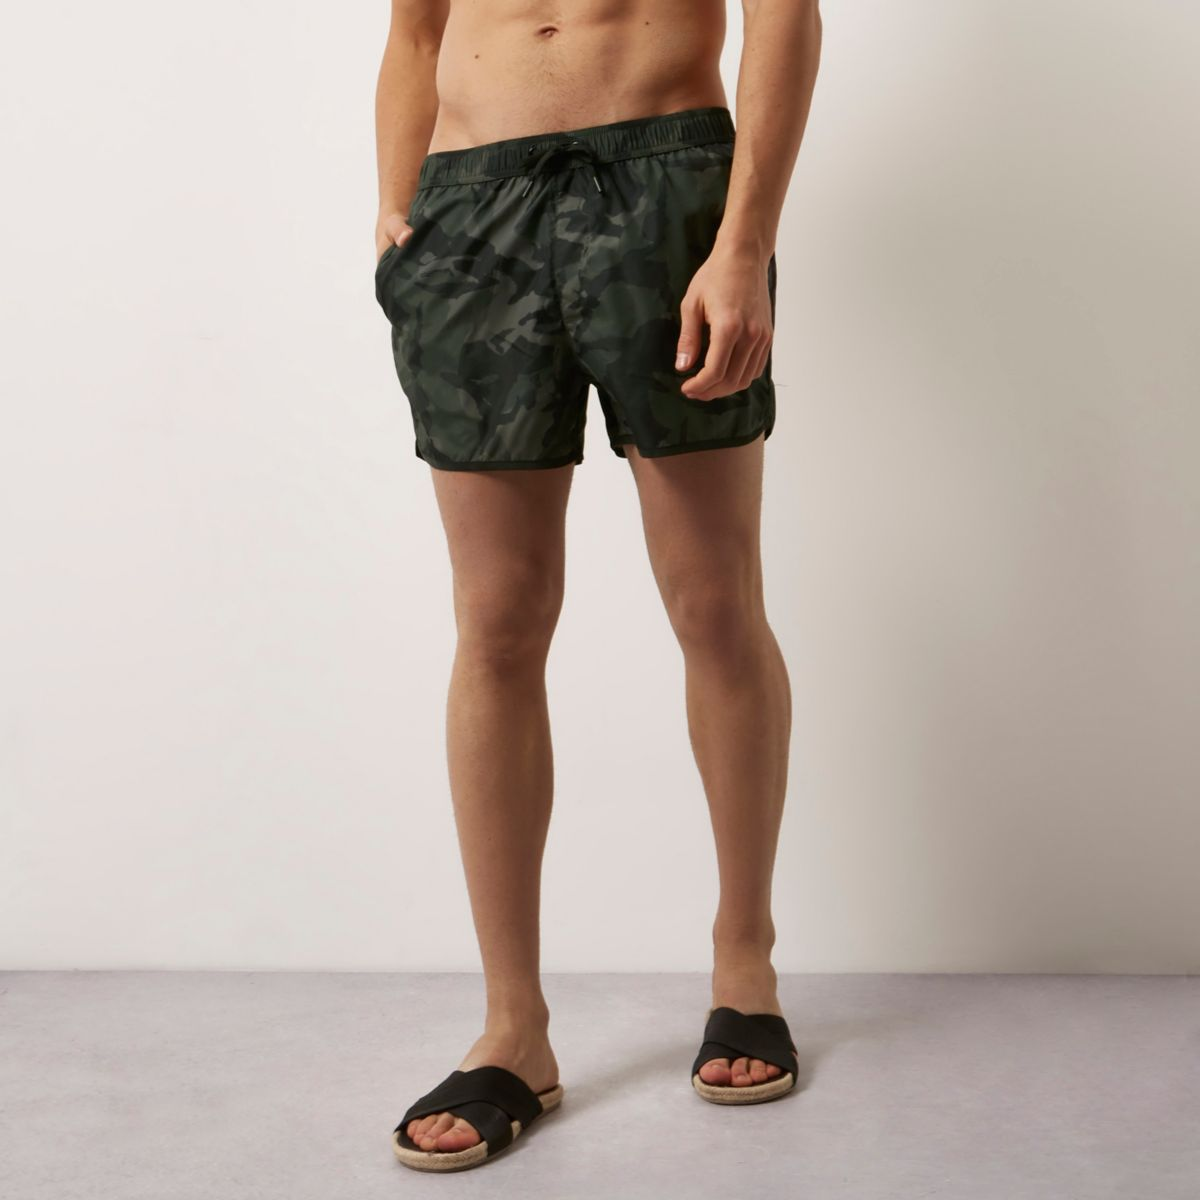 Dark green camo print short swim trunks